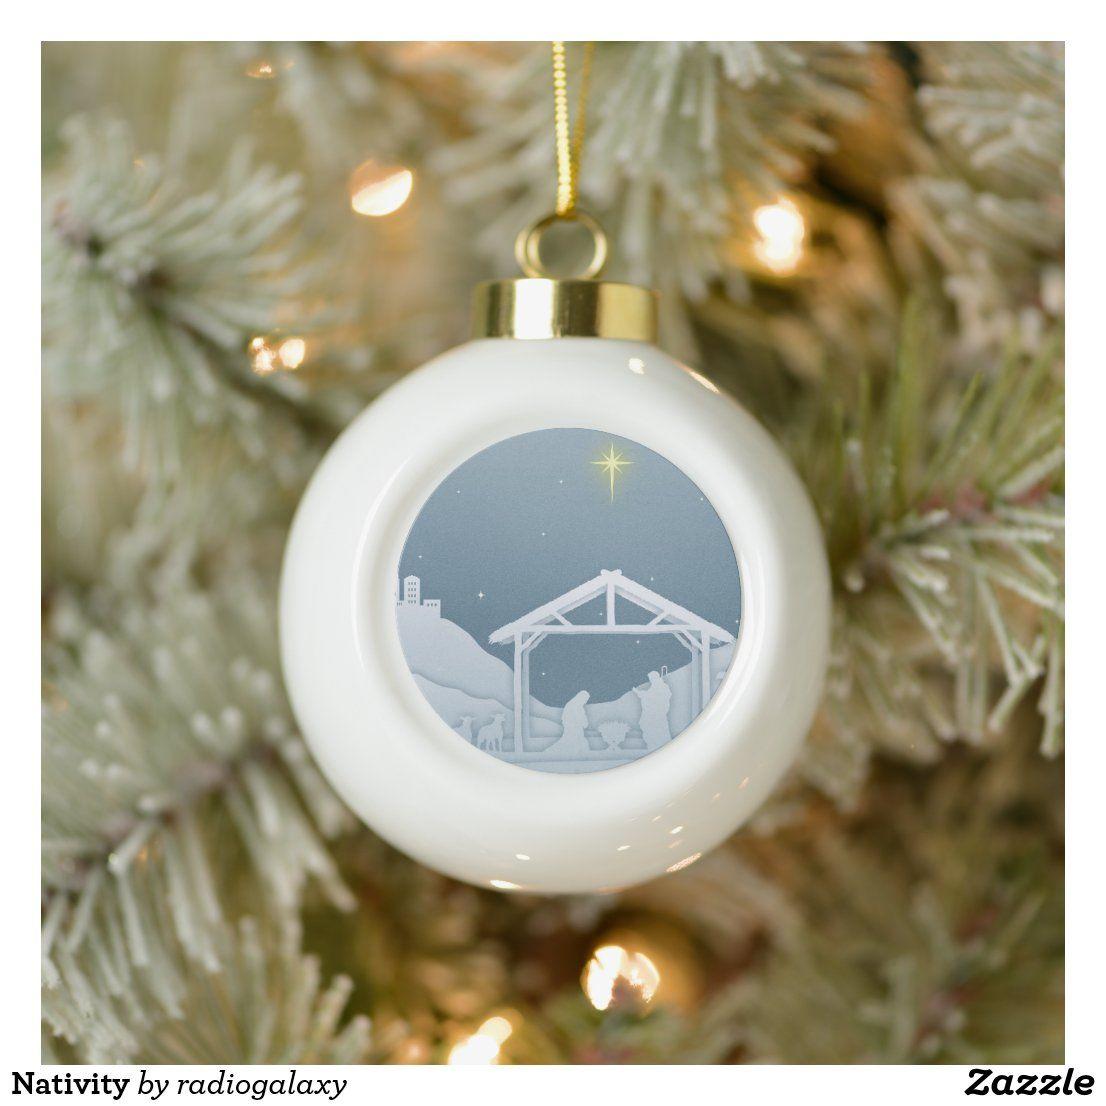 Nativity Ceramic Ball Christmas Ornament Zazzle Com In 2020 Christmas Ornaments Custom Ornament Custom Christmas Ornaments